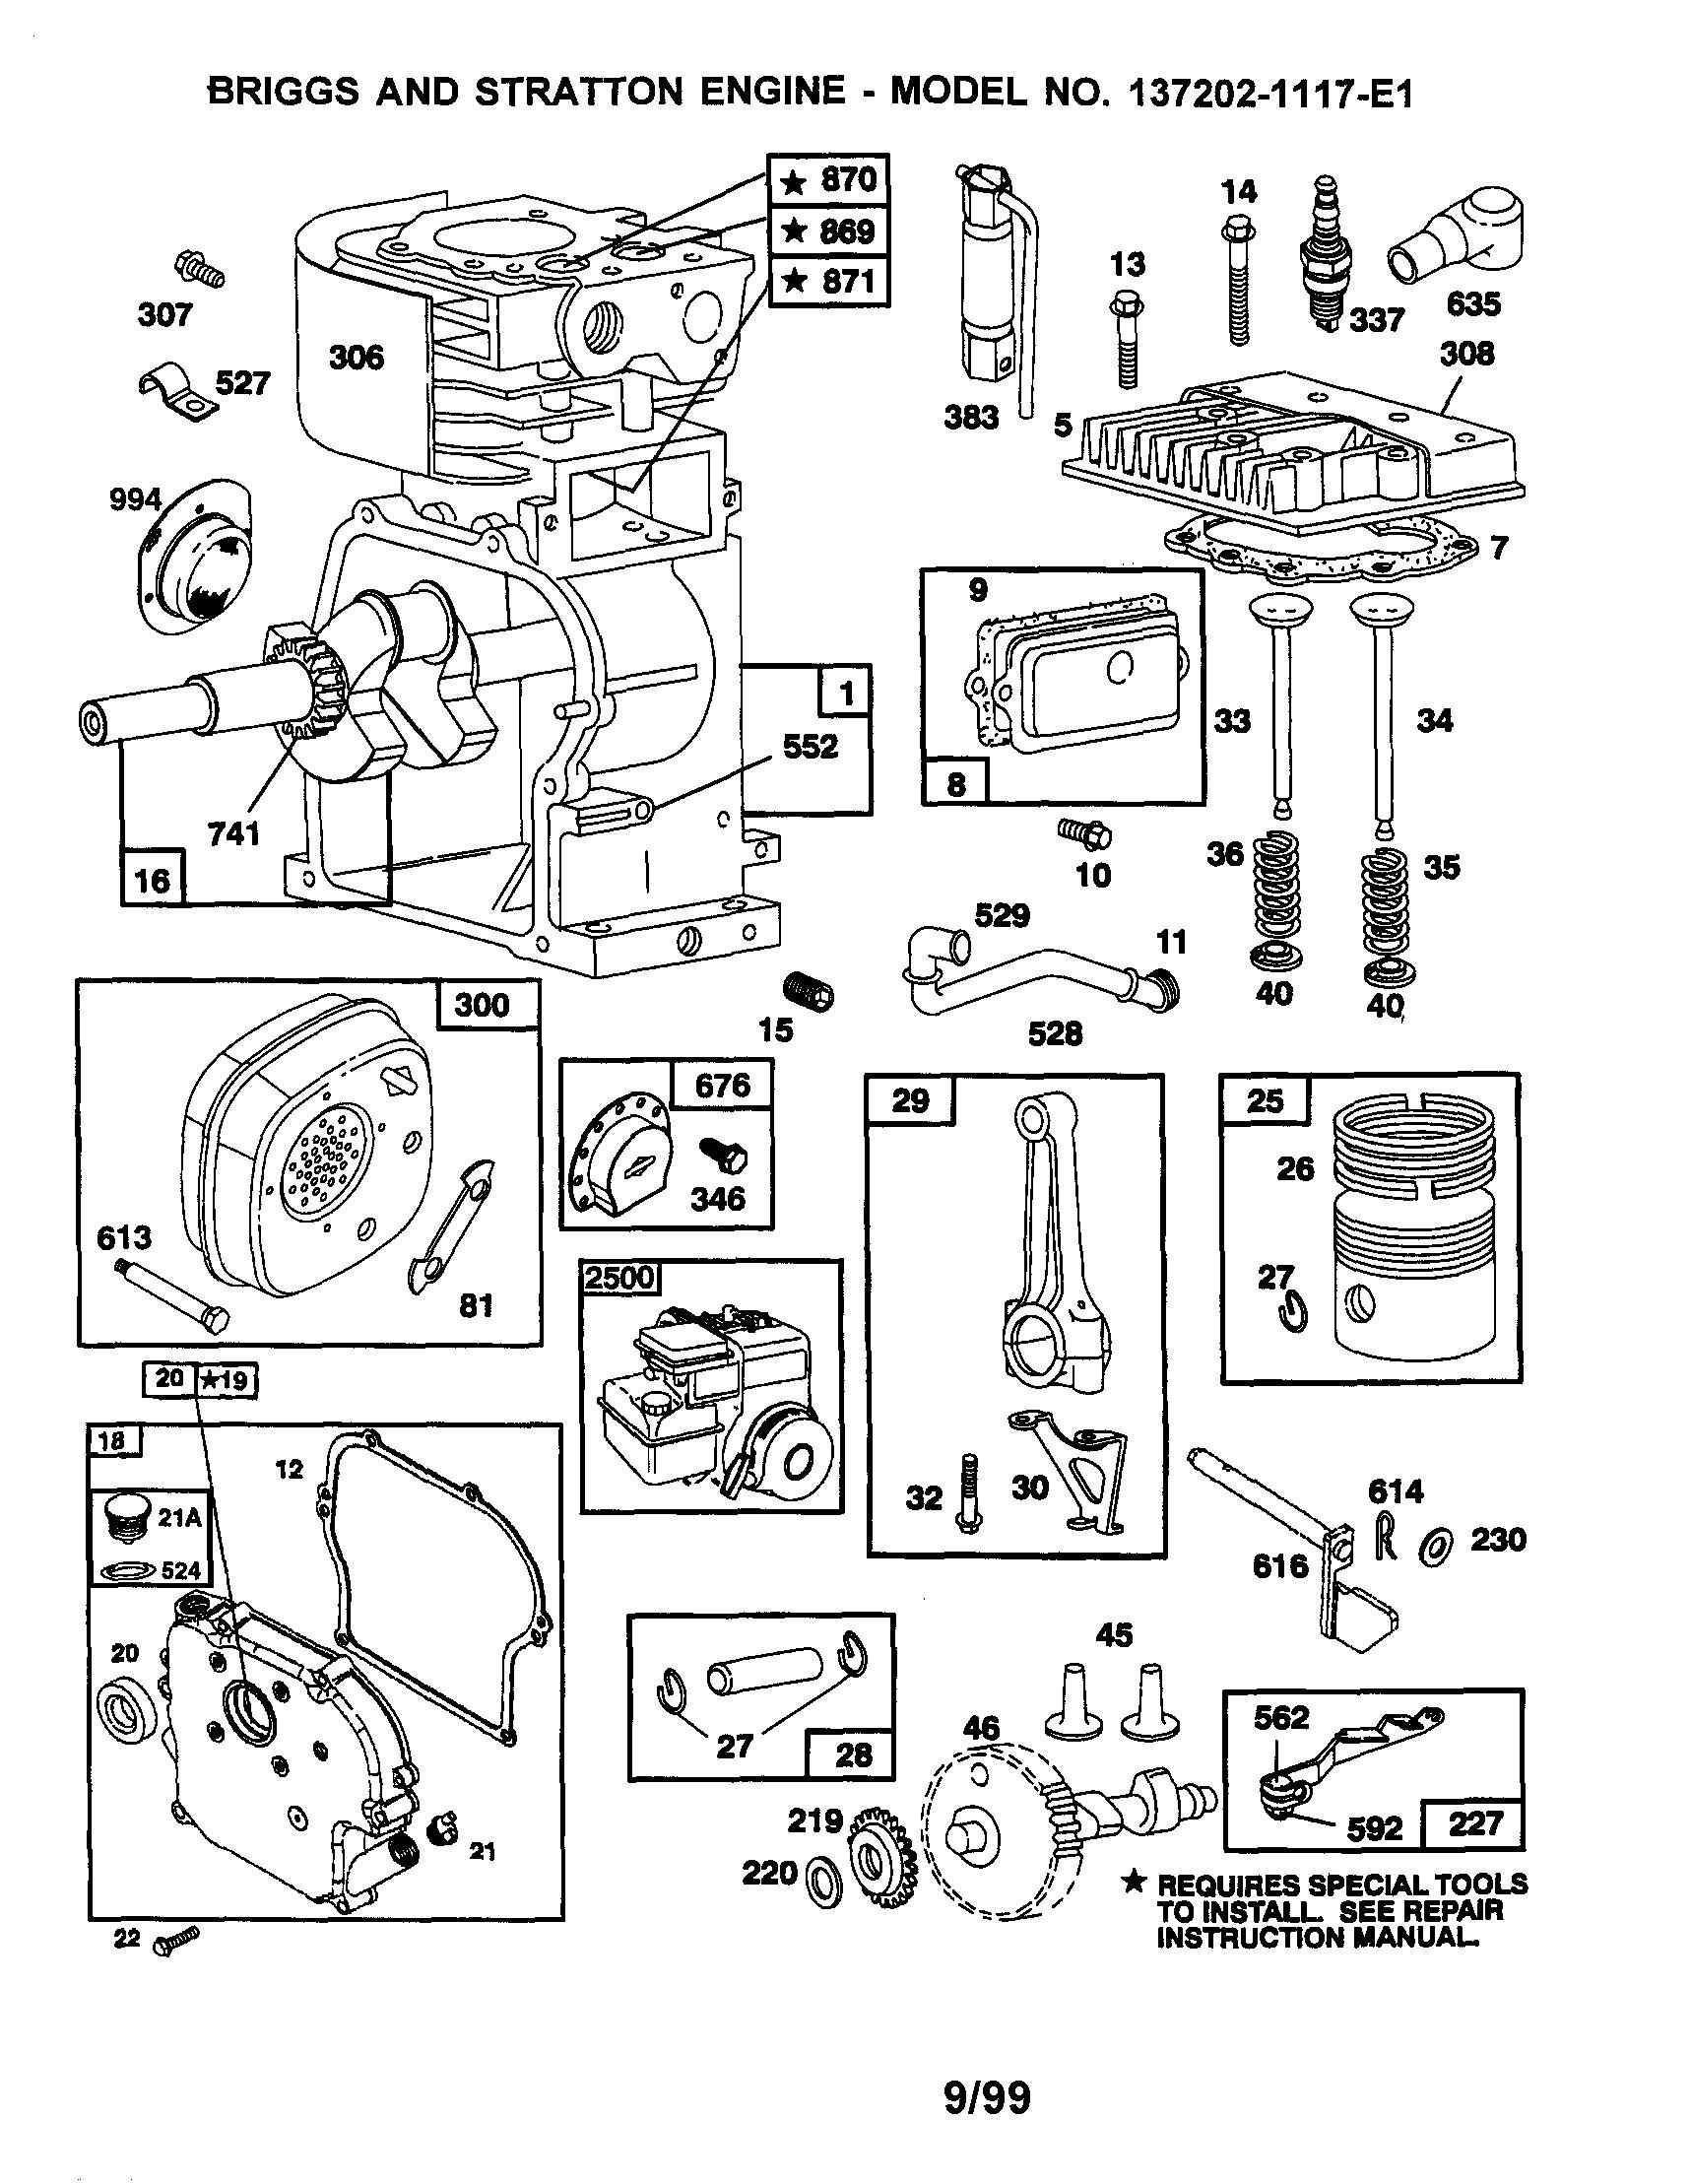 10 Hp Briggs Stratton Carburetor Diagram Wiring Schematic - Wiring  Hp Briggs And Stratton Wiring Schematic on briggs & stratton engine breakdown, briggs stratton kill switch wiring, briggs and stratton alternator wiring, mtd wiring schematic, briggs stratton ignition 3497644, briggs and stratton carburetor schematic, briggs stratton carburetor diagram, briggs and stratton wiring guide, briggs stratton 16 hp tractor wiring diagram, briggs governor spring placement, briggs stratton 1 2 hp wiring, briggs stratton ignition diagram, briggs stratton 18 hp 422707, briggs and stratton wiring diag, briggs parts diagram, briggs and stratton 135212 schematic, briggs stratton 18 hp 3500, ariens wiring schematic, lawn mower stator wiring schematic, briggs and stratton riding lawn mower wiring diagram,